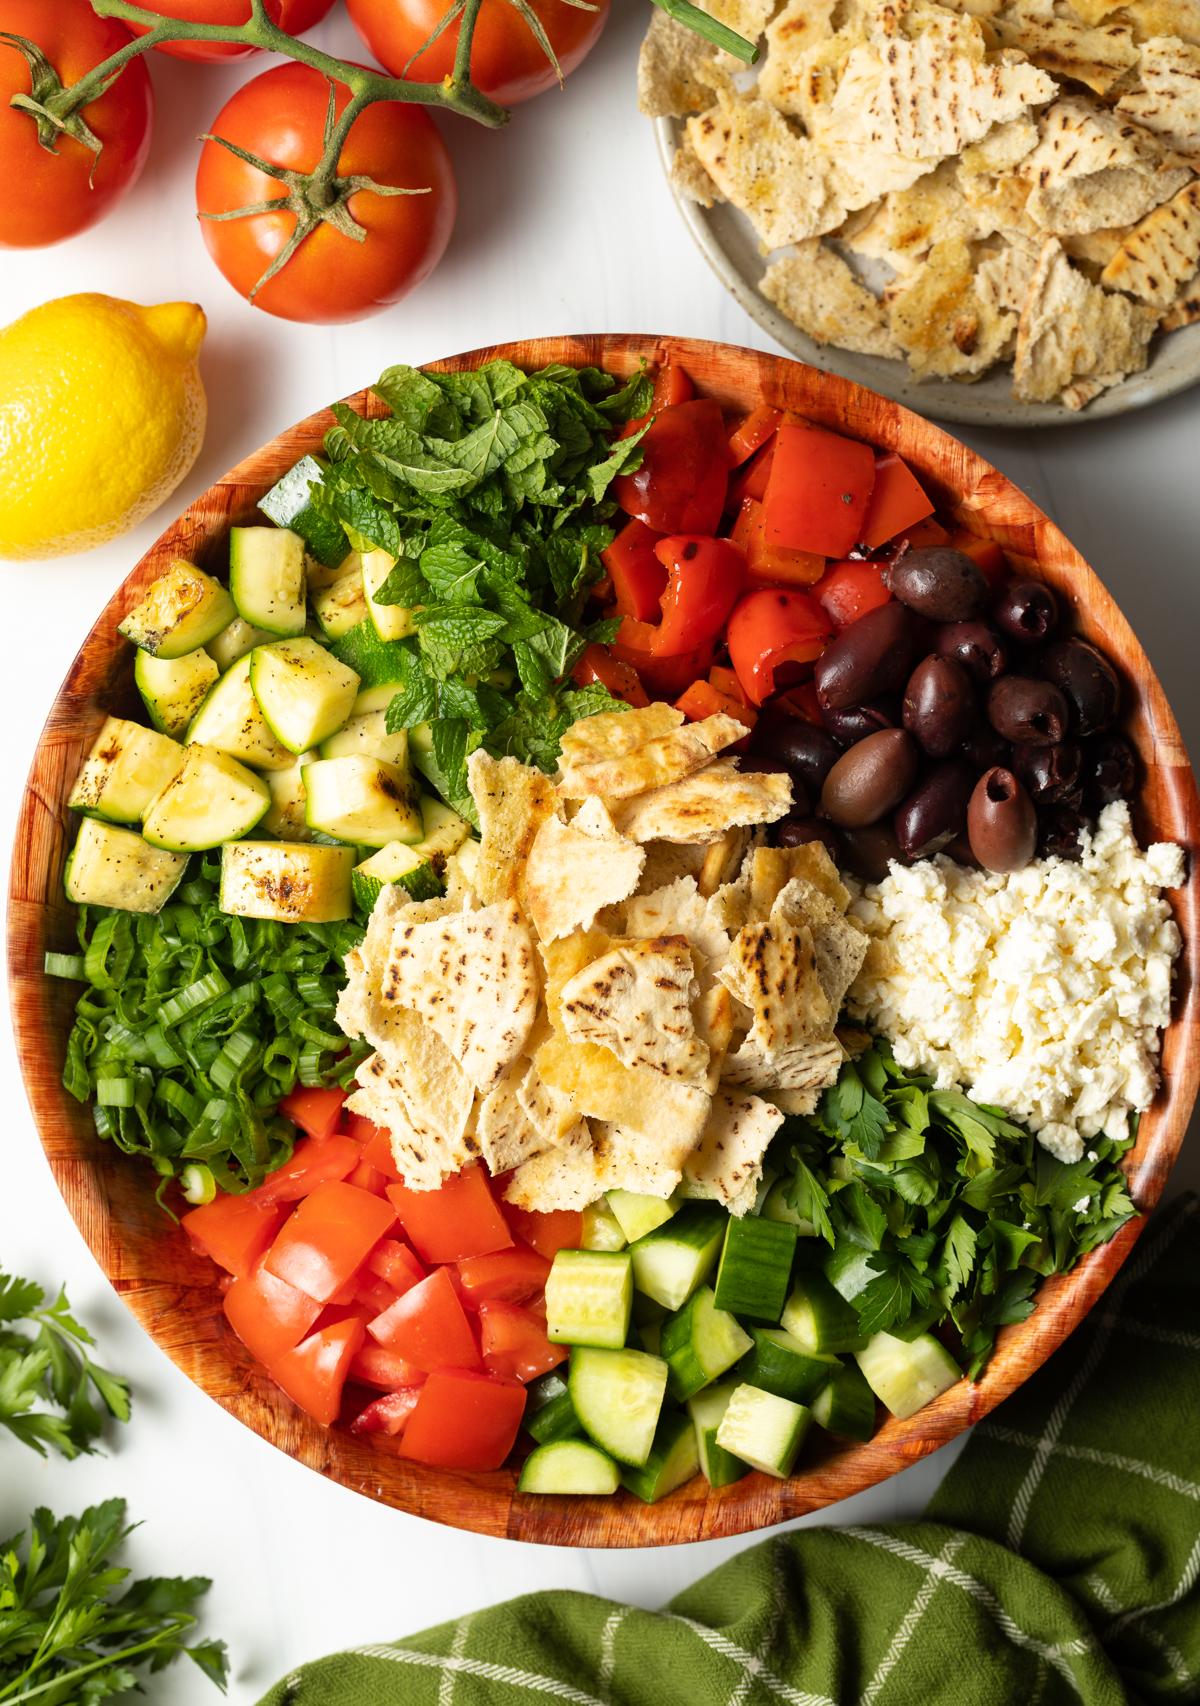 Fattoush Salad Recipe with Pitas